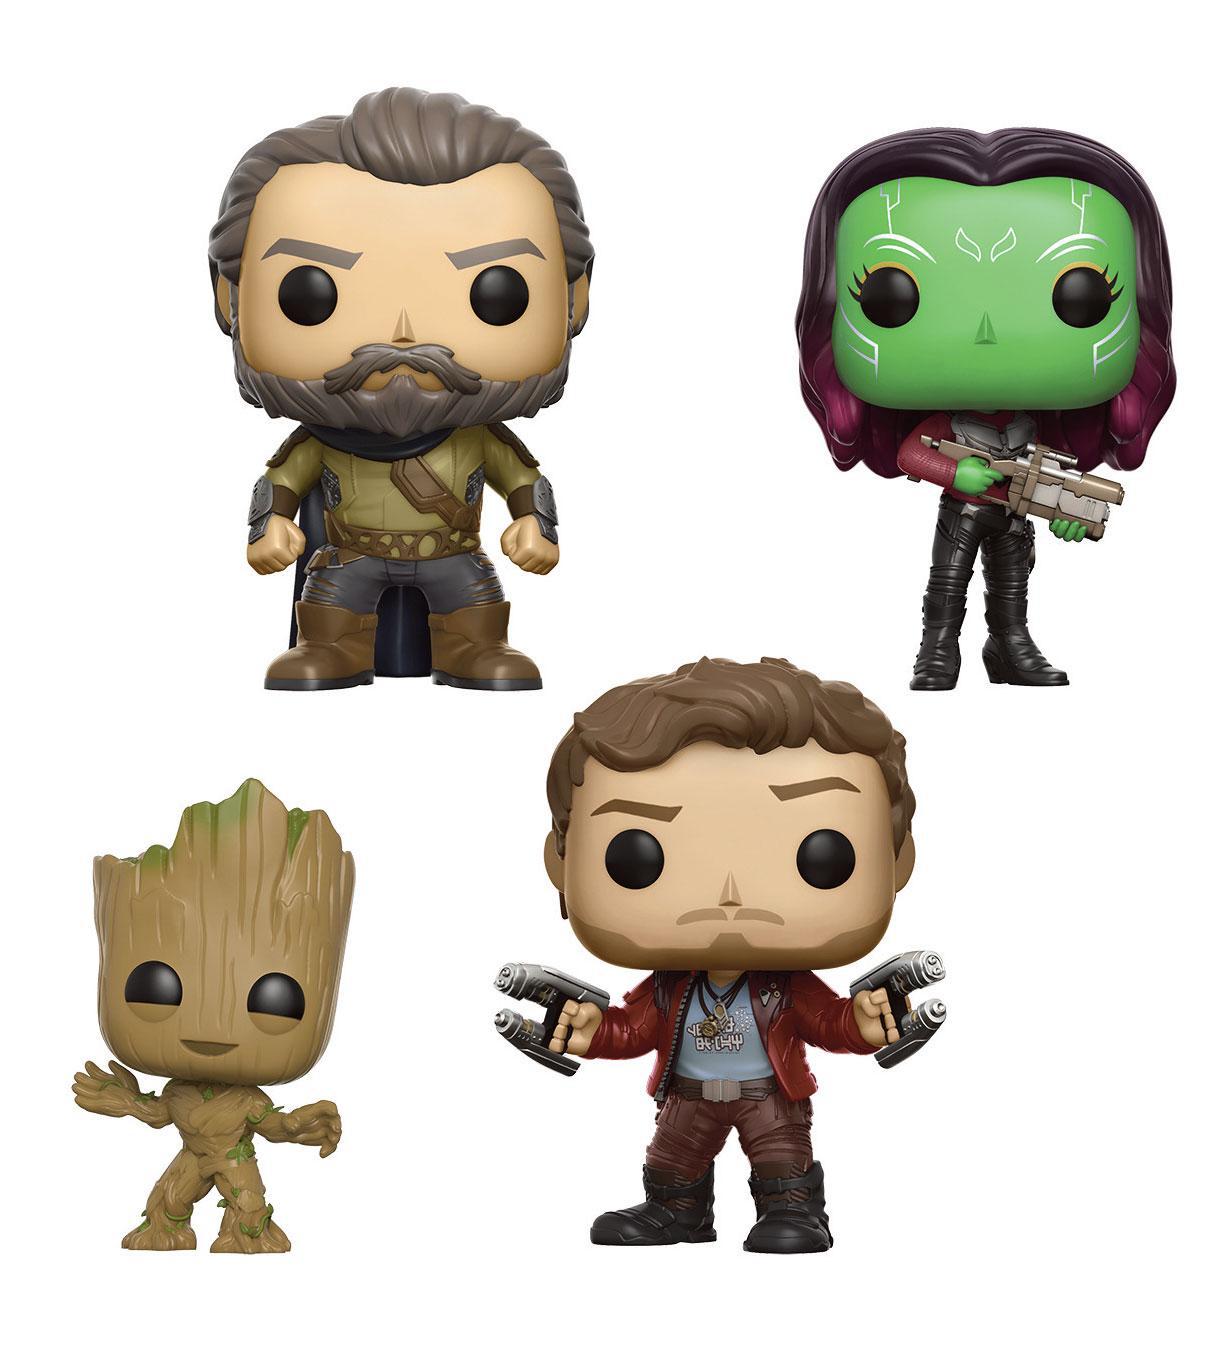 Guardians of the Galaxy 2 POP! Marvel Vinyl Figures 4-Pack Set II 9 cm